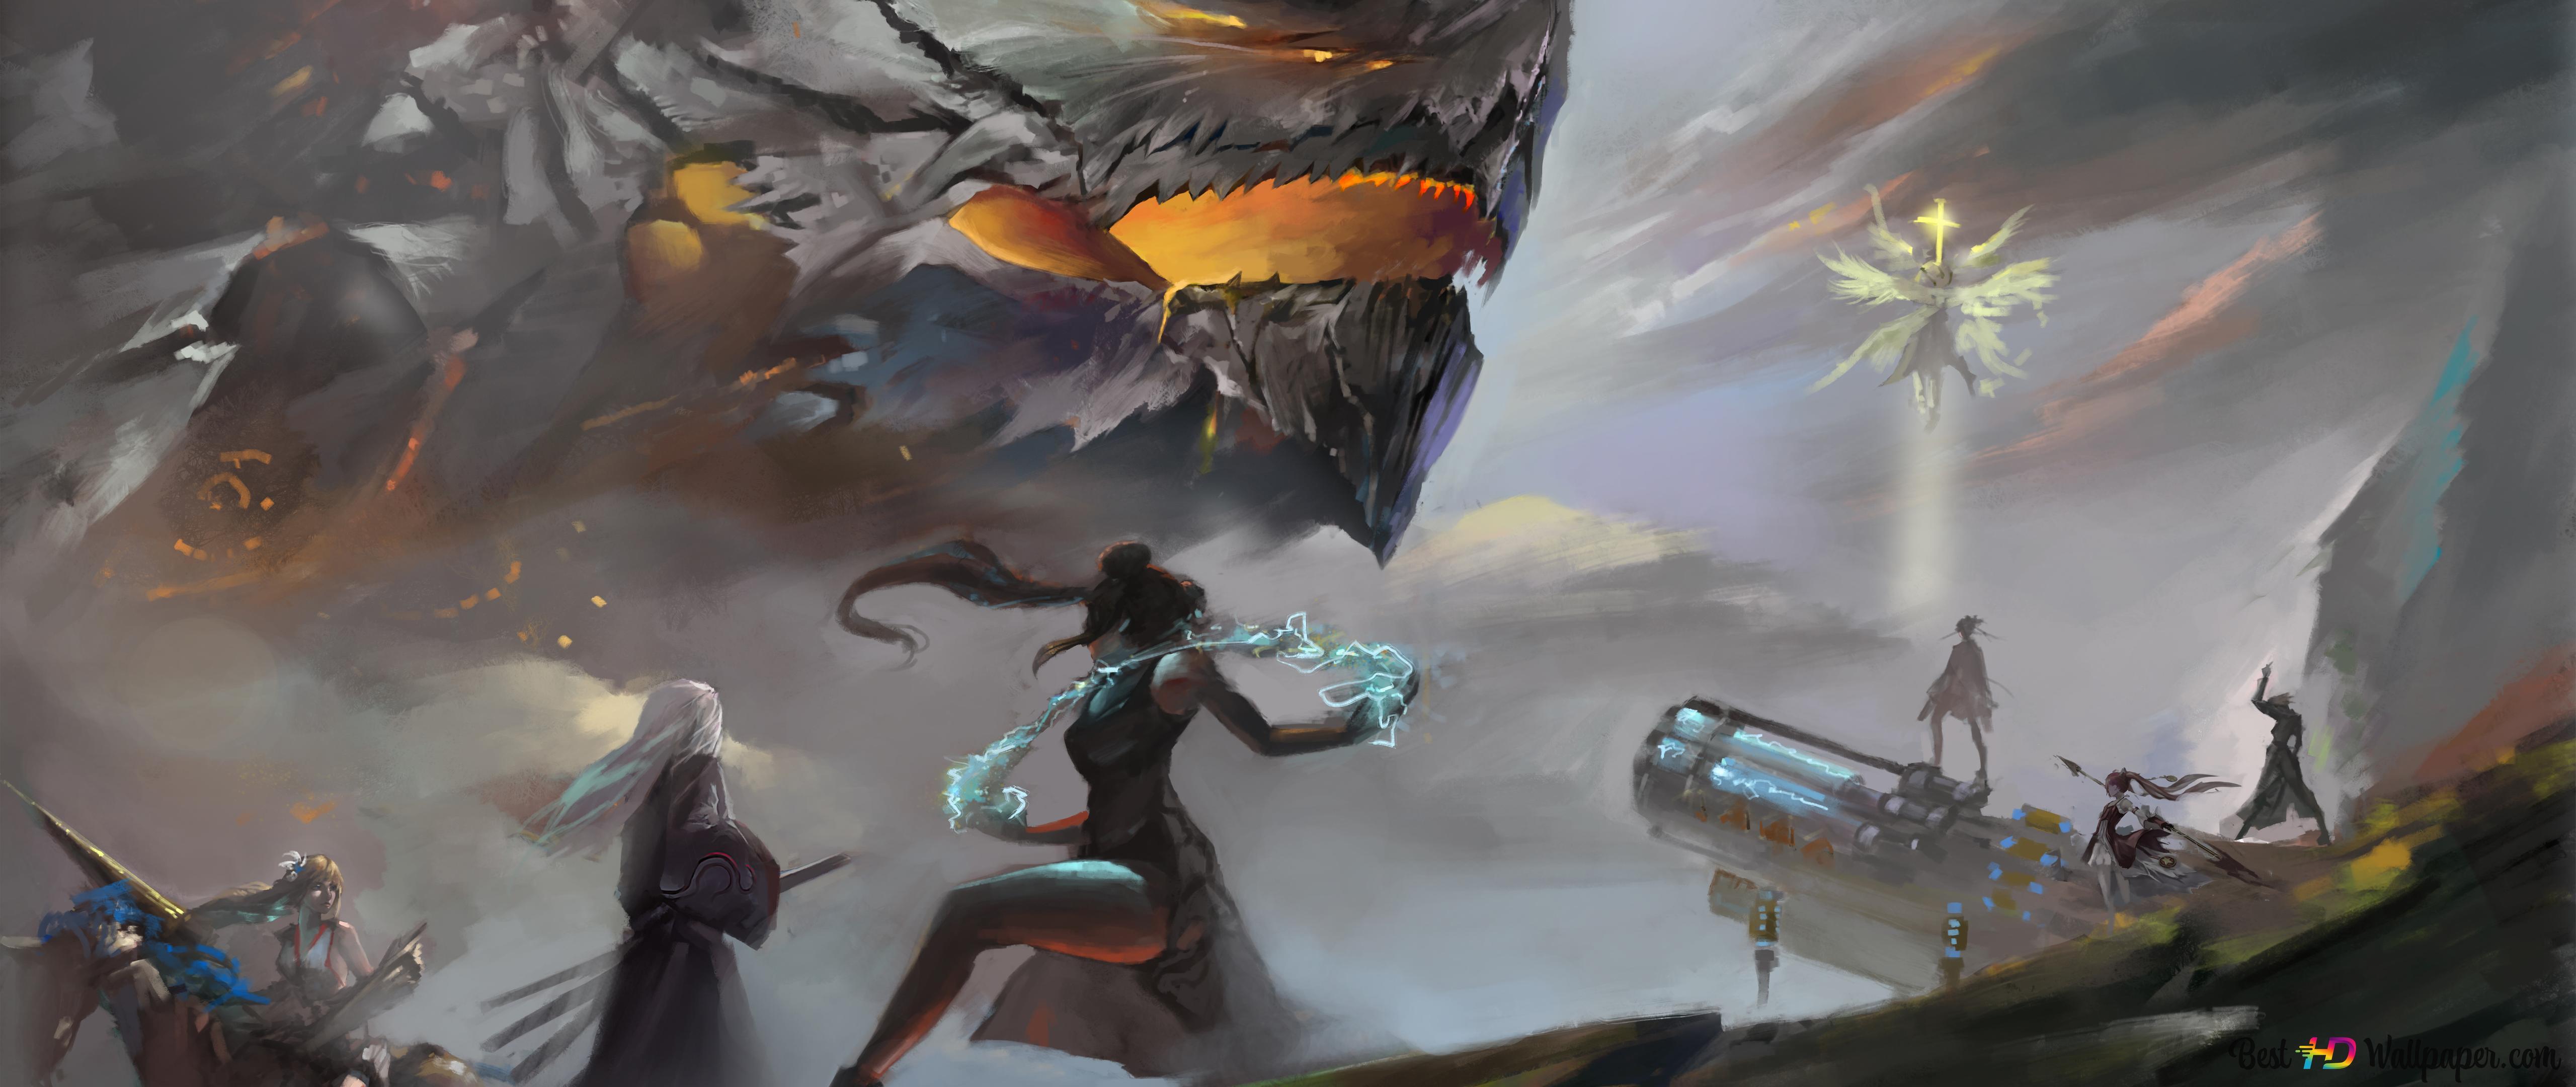 Dungeon Fighter Online Dragon Battle Hd Wallpaper Download